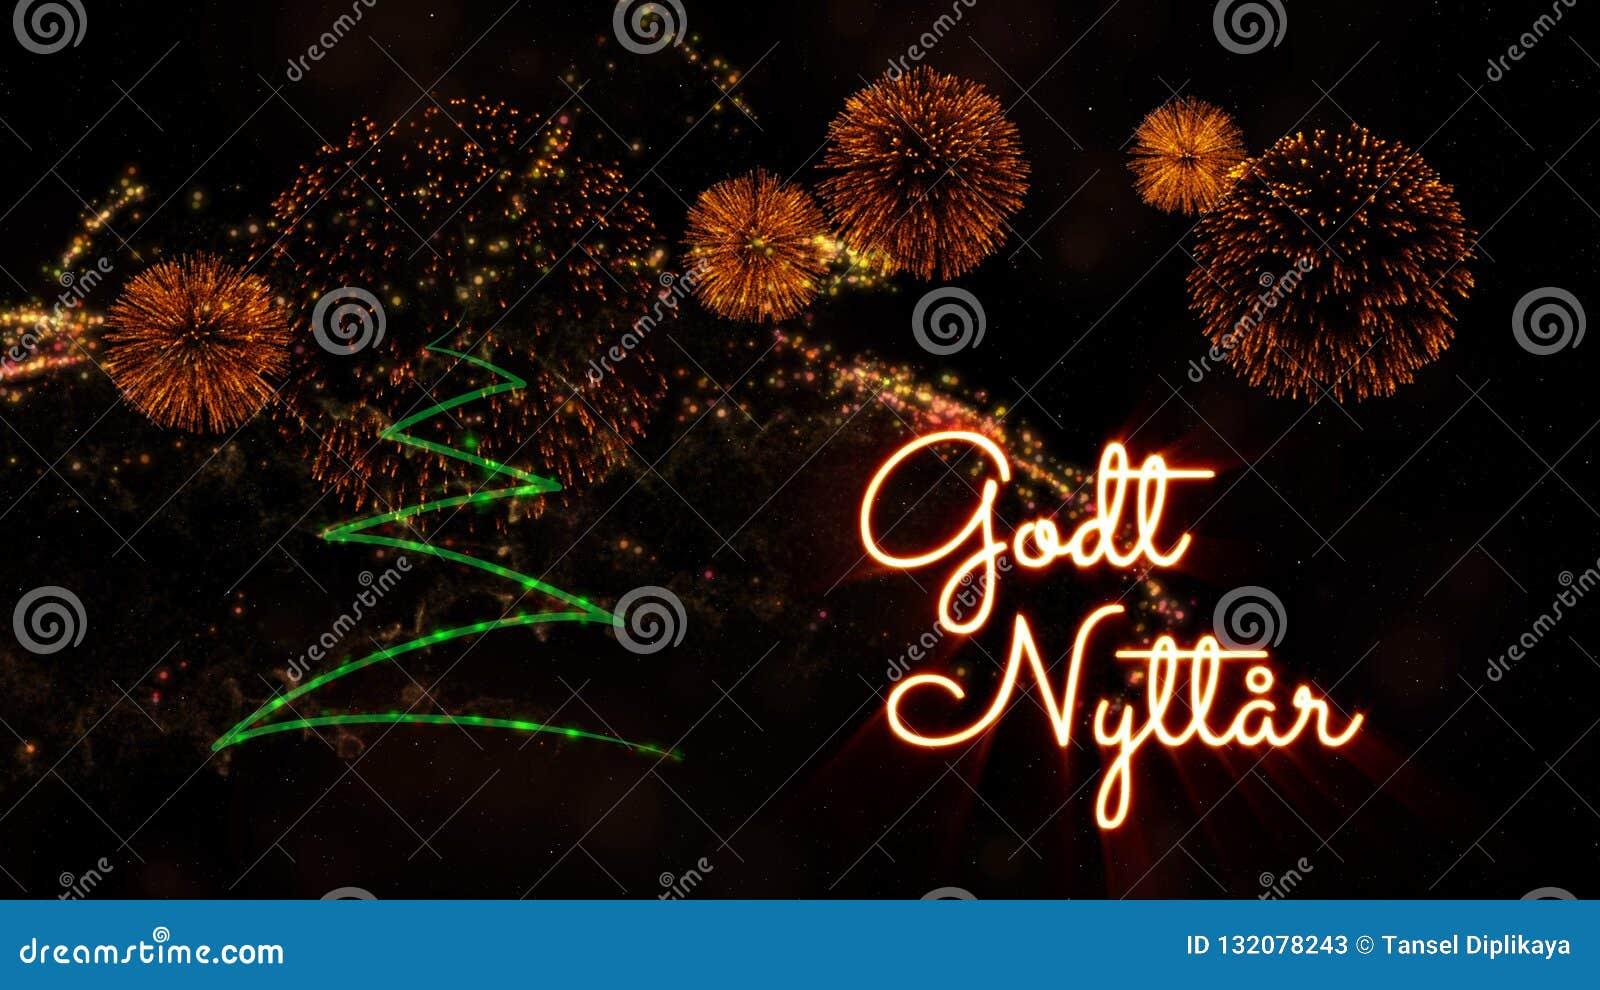 Happy New Year Text In Norwegian 'Godt Nyttar' Over Pine ...